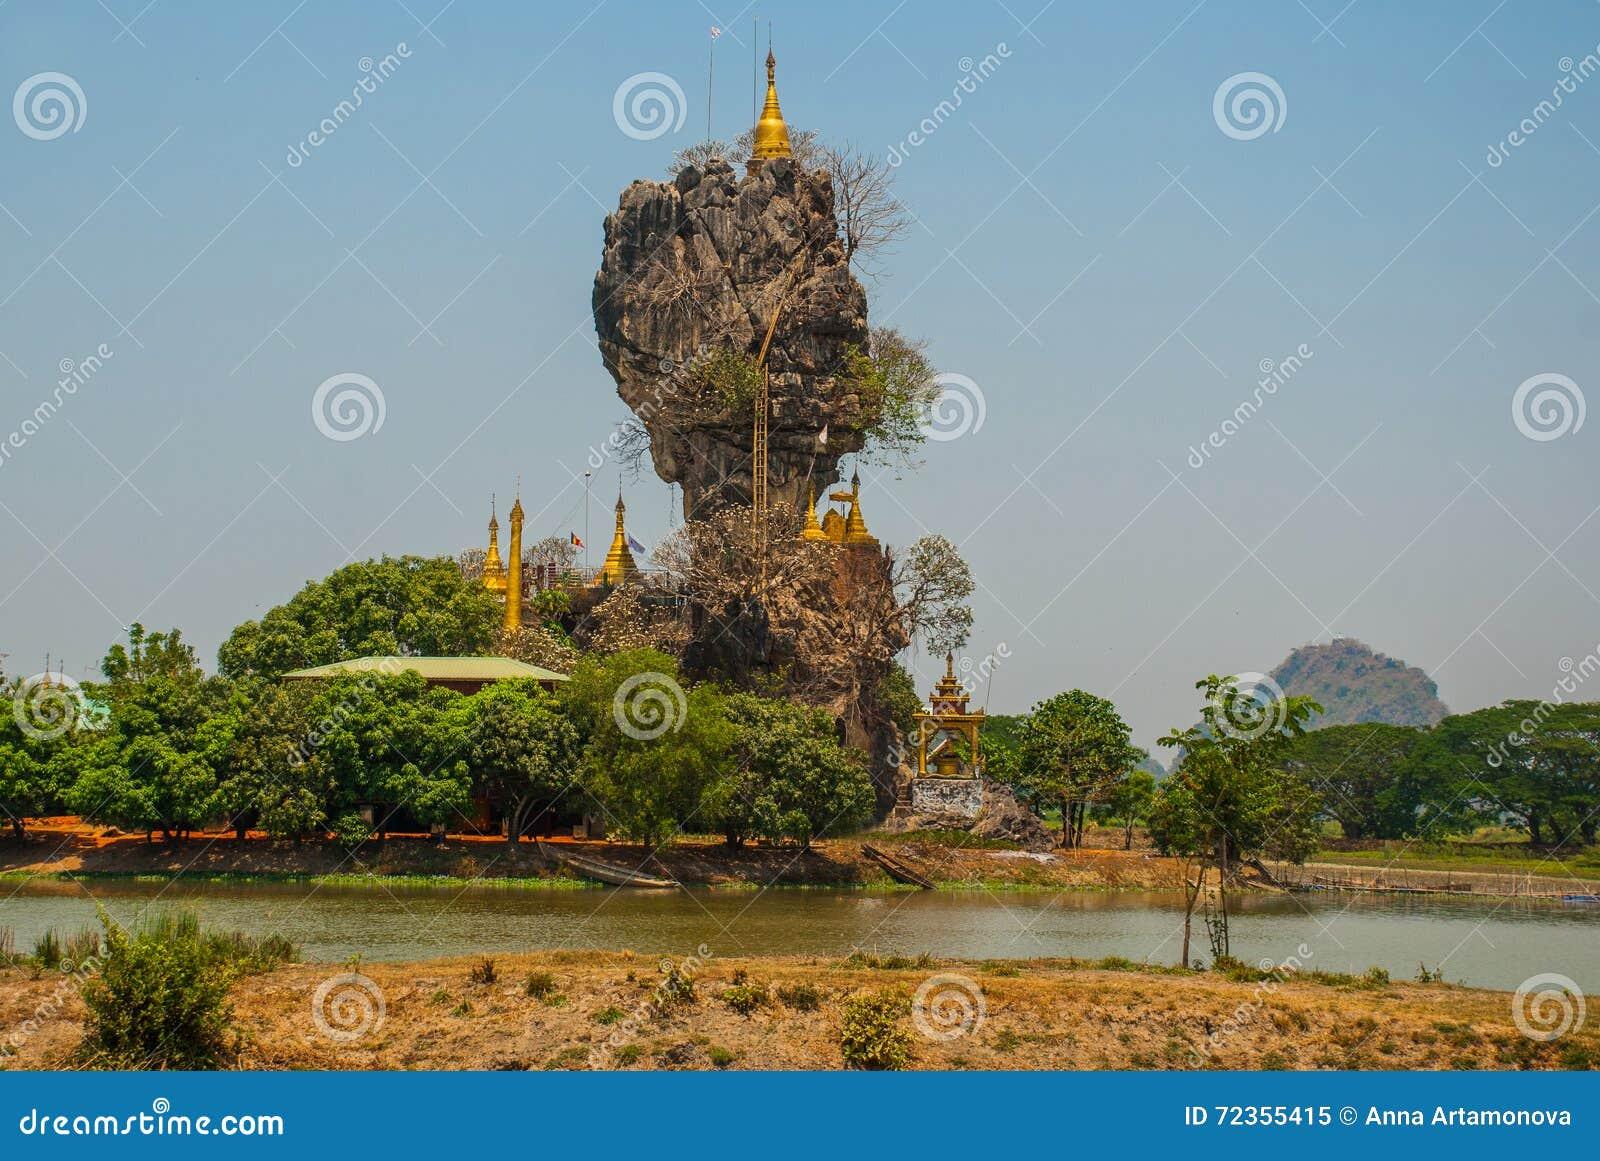 Kyauk Kalat塔 毛淡棉, Hha-an 缅甸 缅甸 小塔在一个陡峭的岩石被架设了